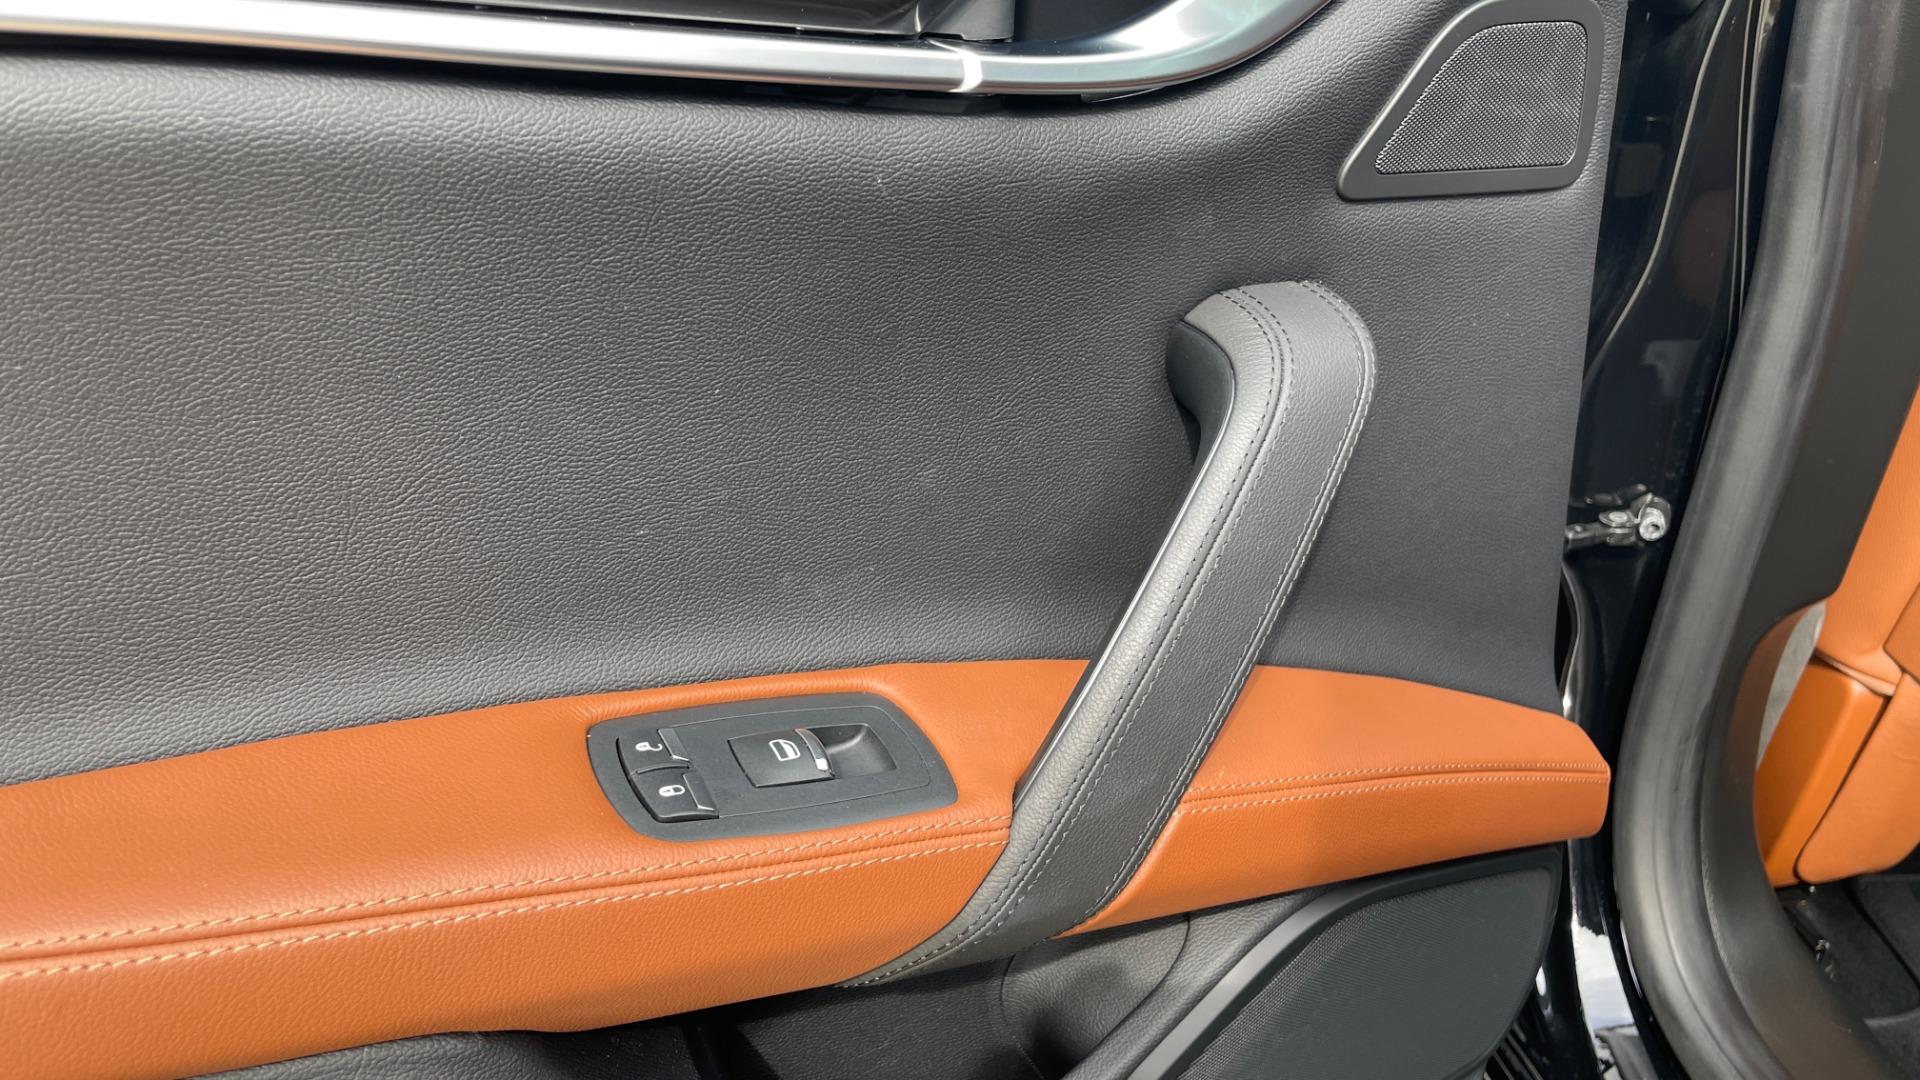 Used 2018 Maserati GHIBLI 3.0L SEDAN / 8-SPD AUTO / NAV / SUNROOF / REARVIEW for sale $42,995 at Formula Imports in Charlotte NC 28227 47